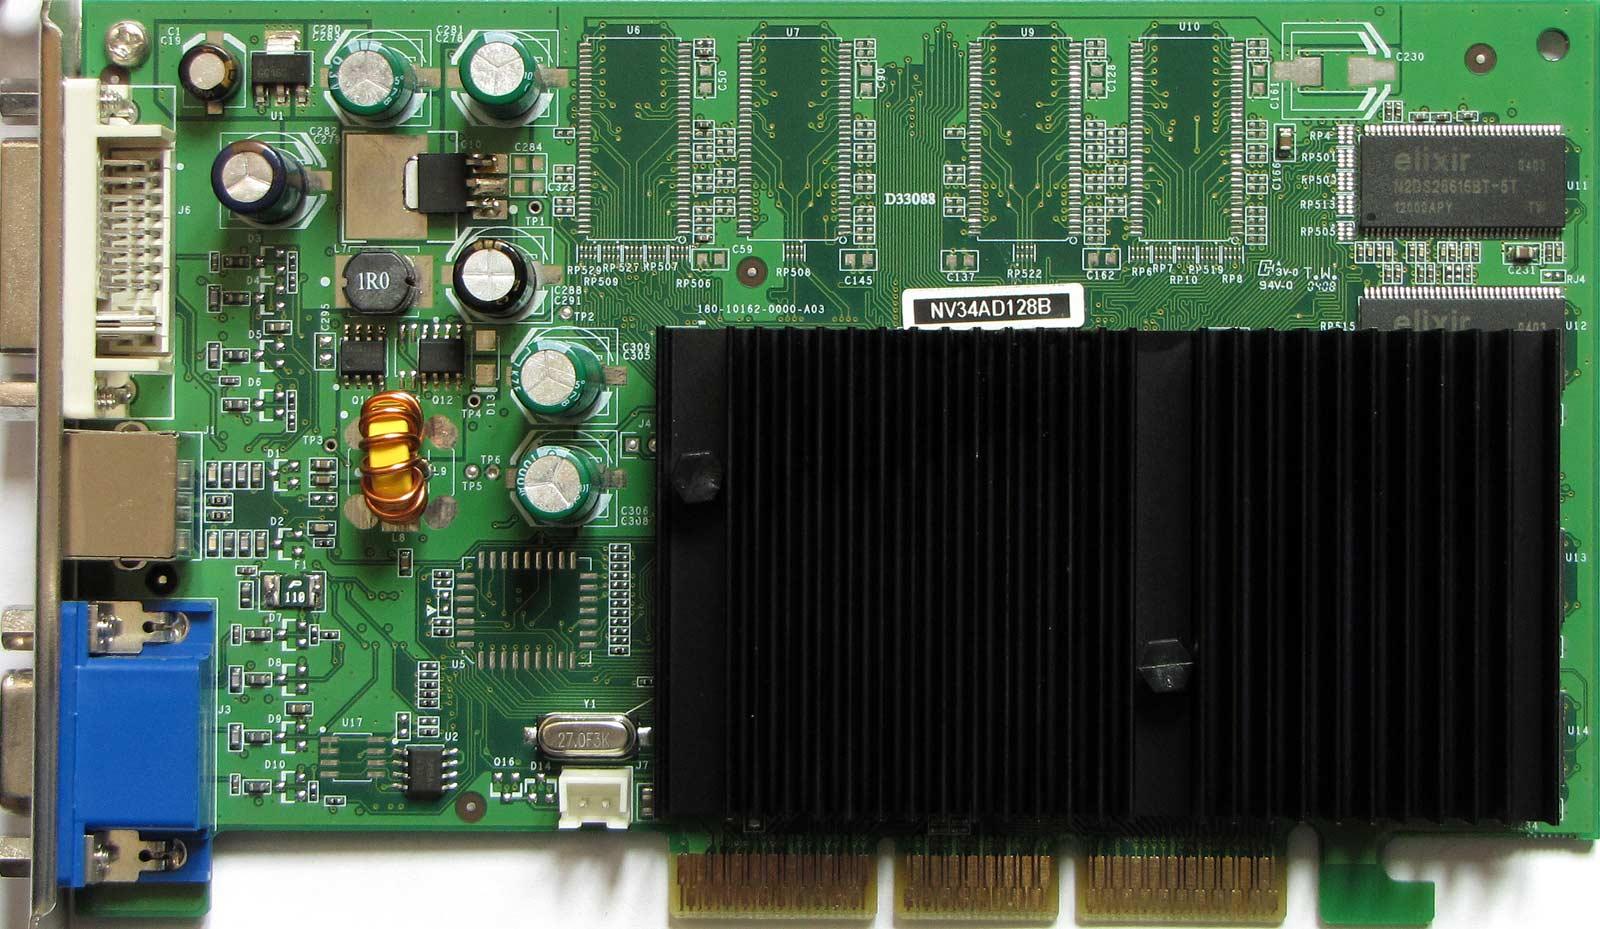 NVIDIA GEFORCE FX TÉLÉCHARGER CORPORATION 5200 NV34